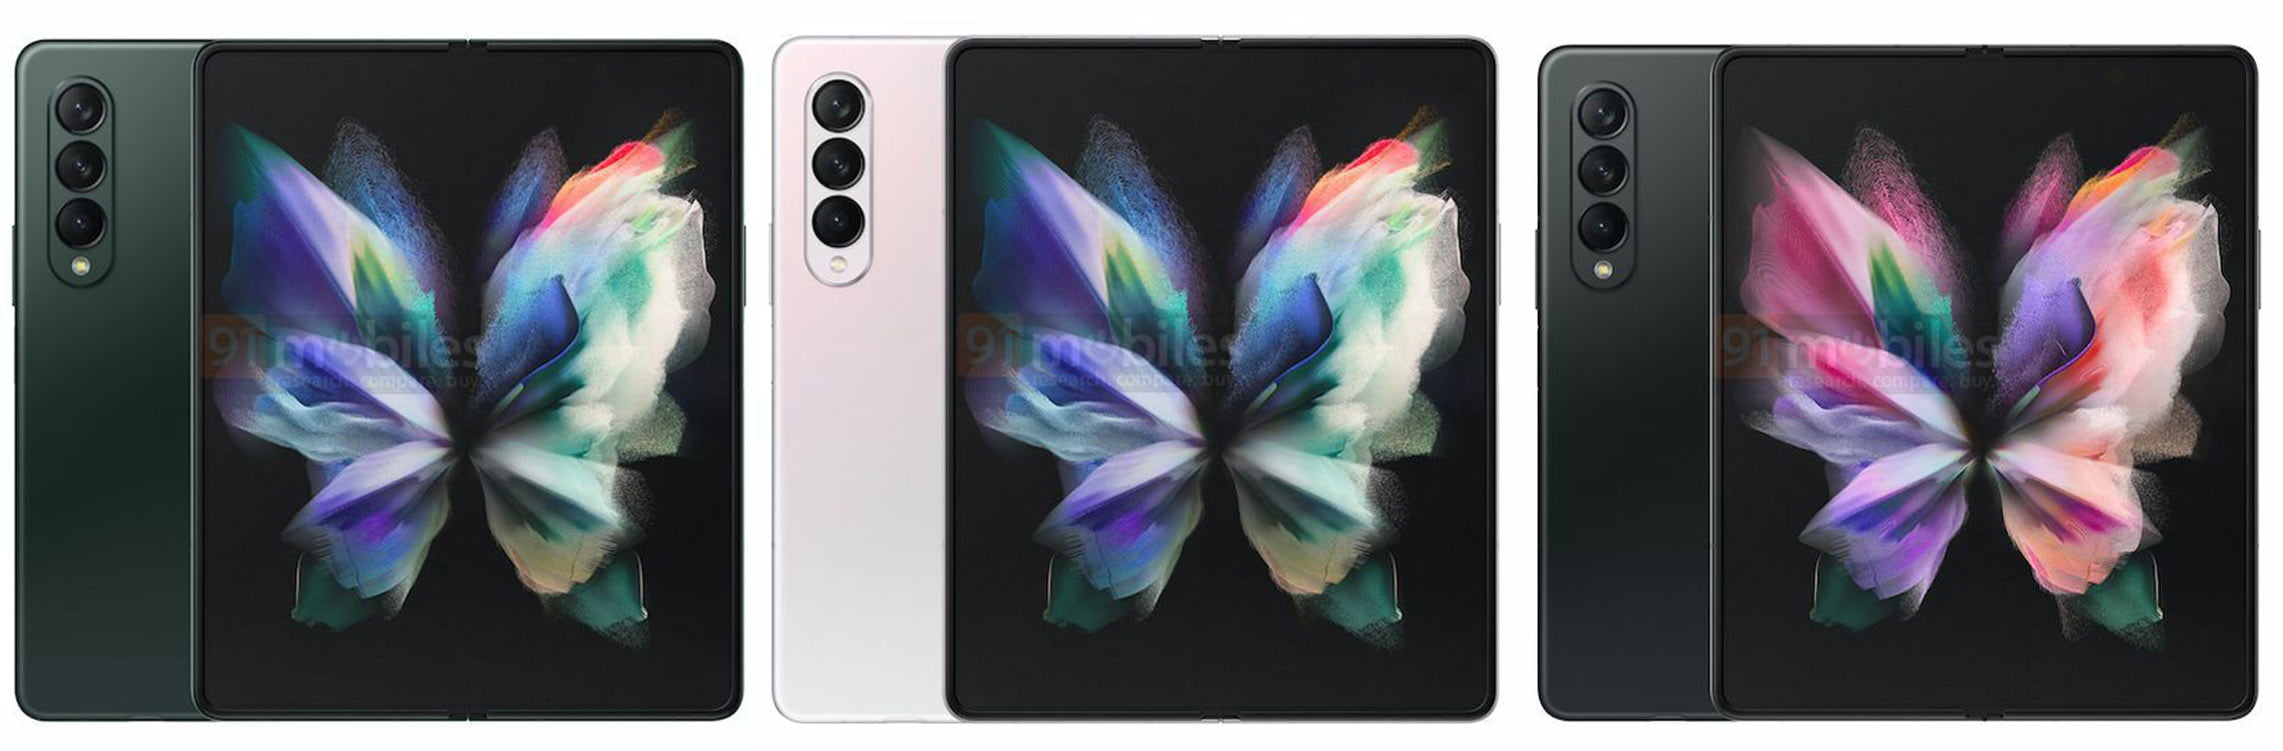 Samsung Galaxy Fold 4 model color options leak.